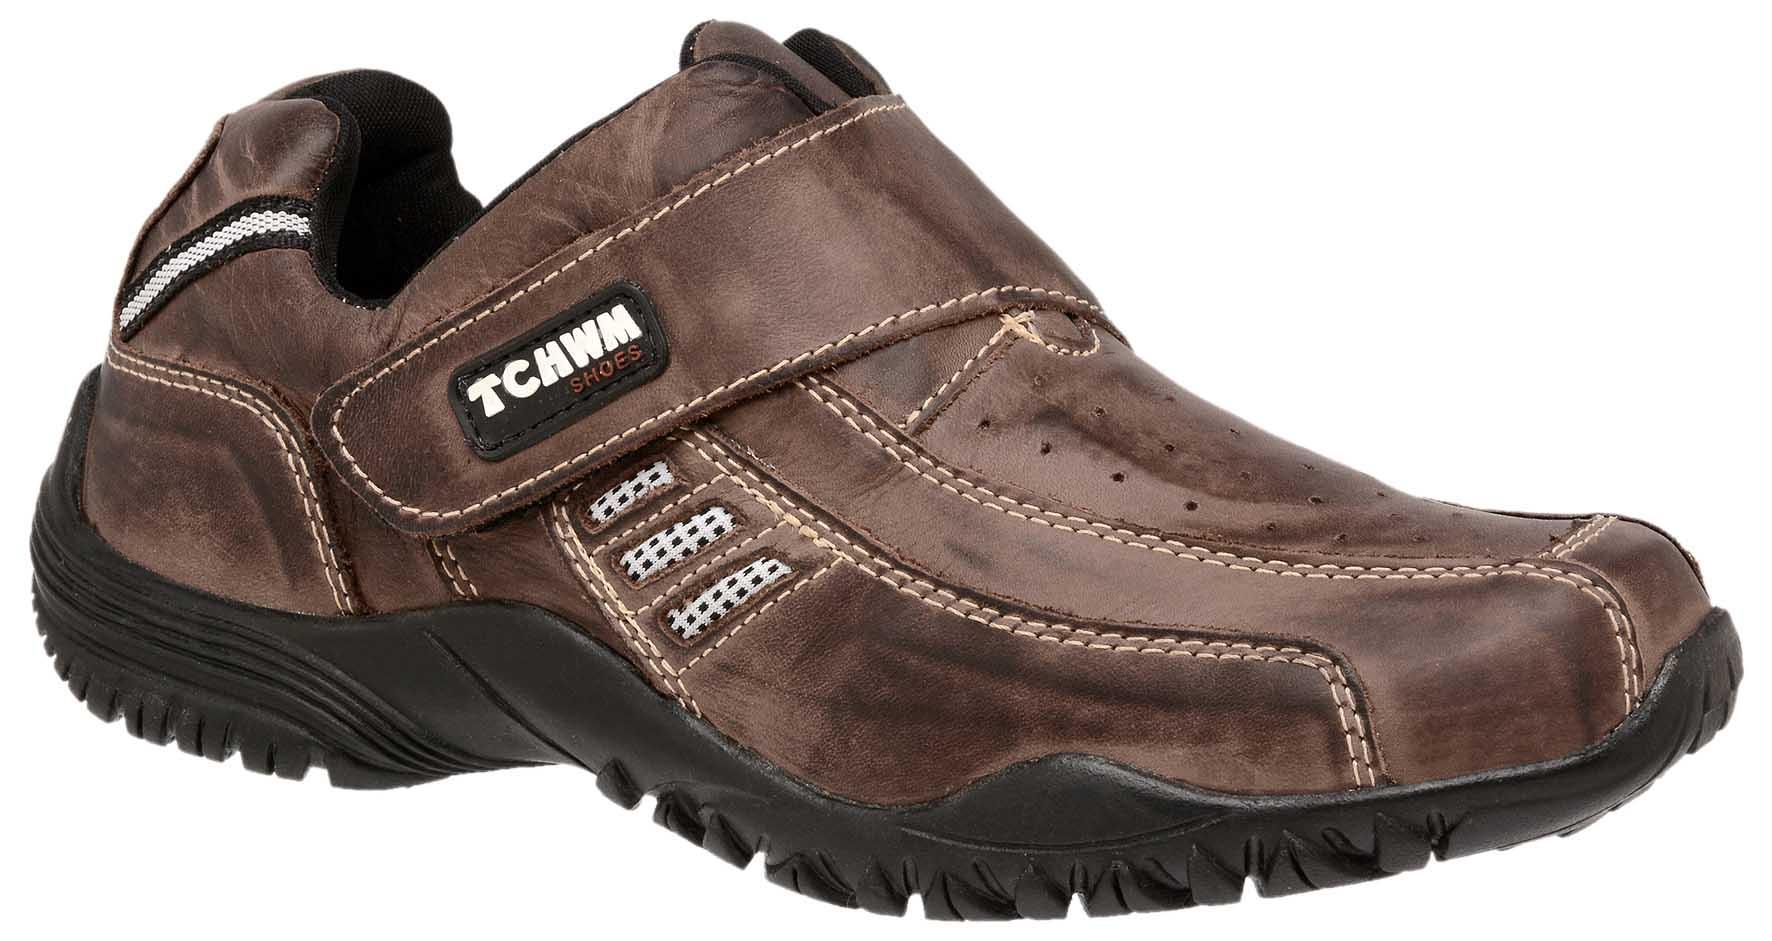 2d4f29387c Sapatênis Masculino Tchwm Shoes Couro - Marrom